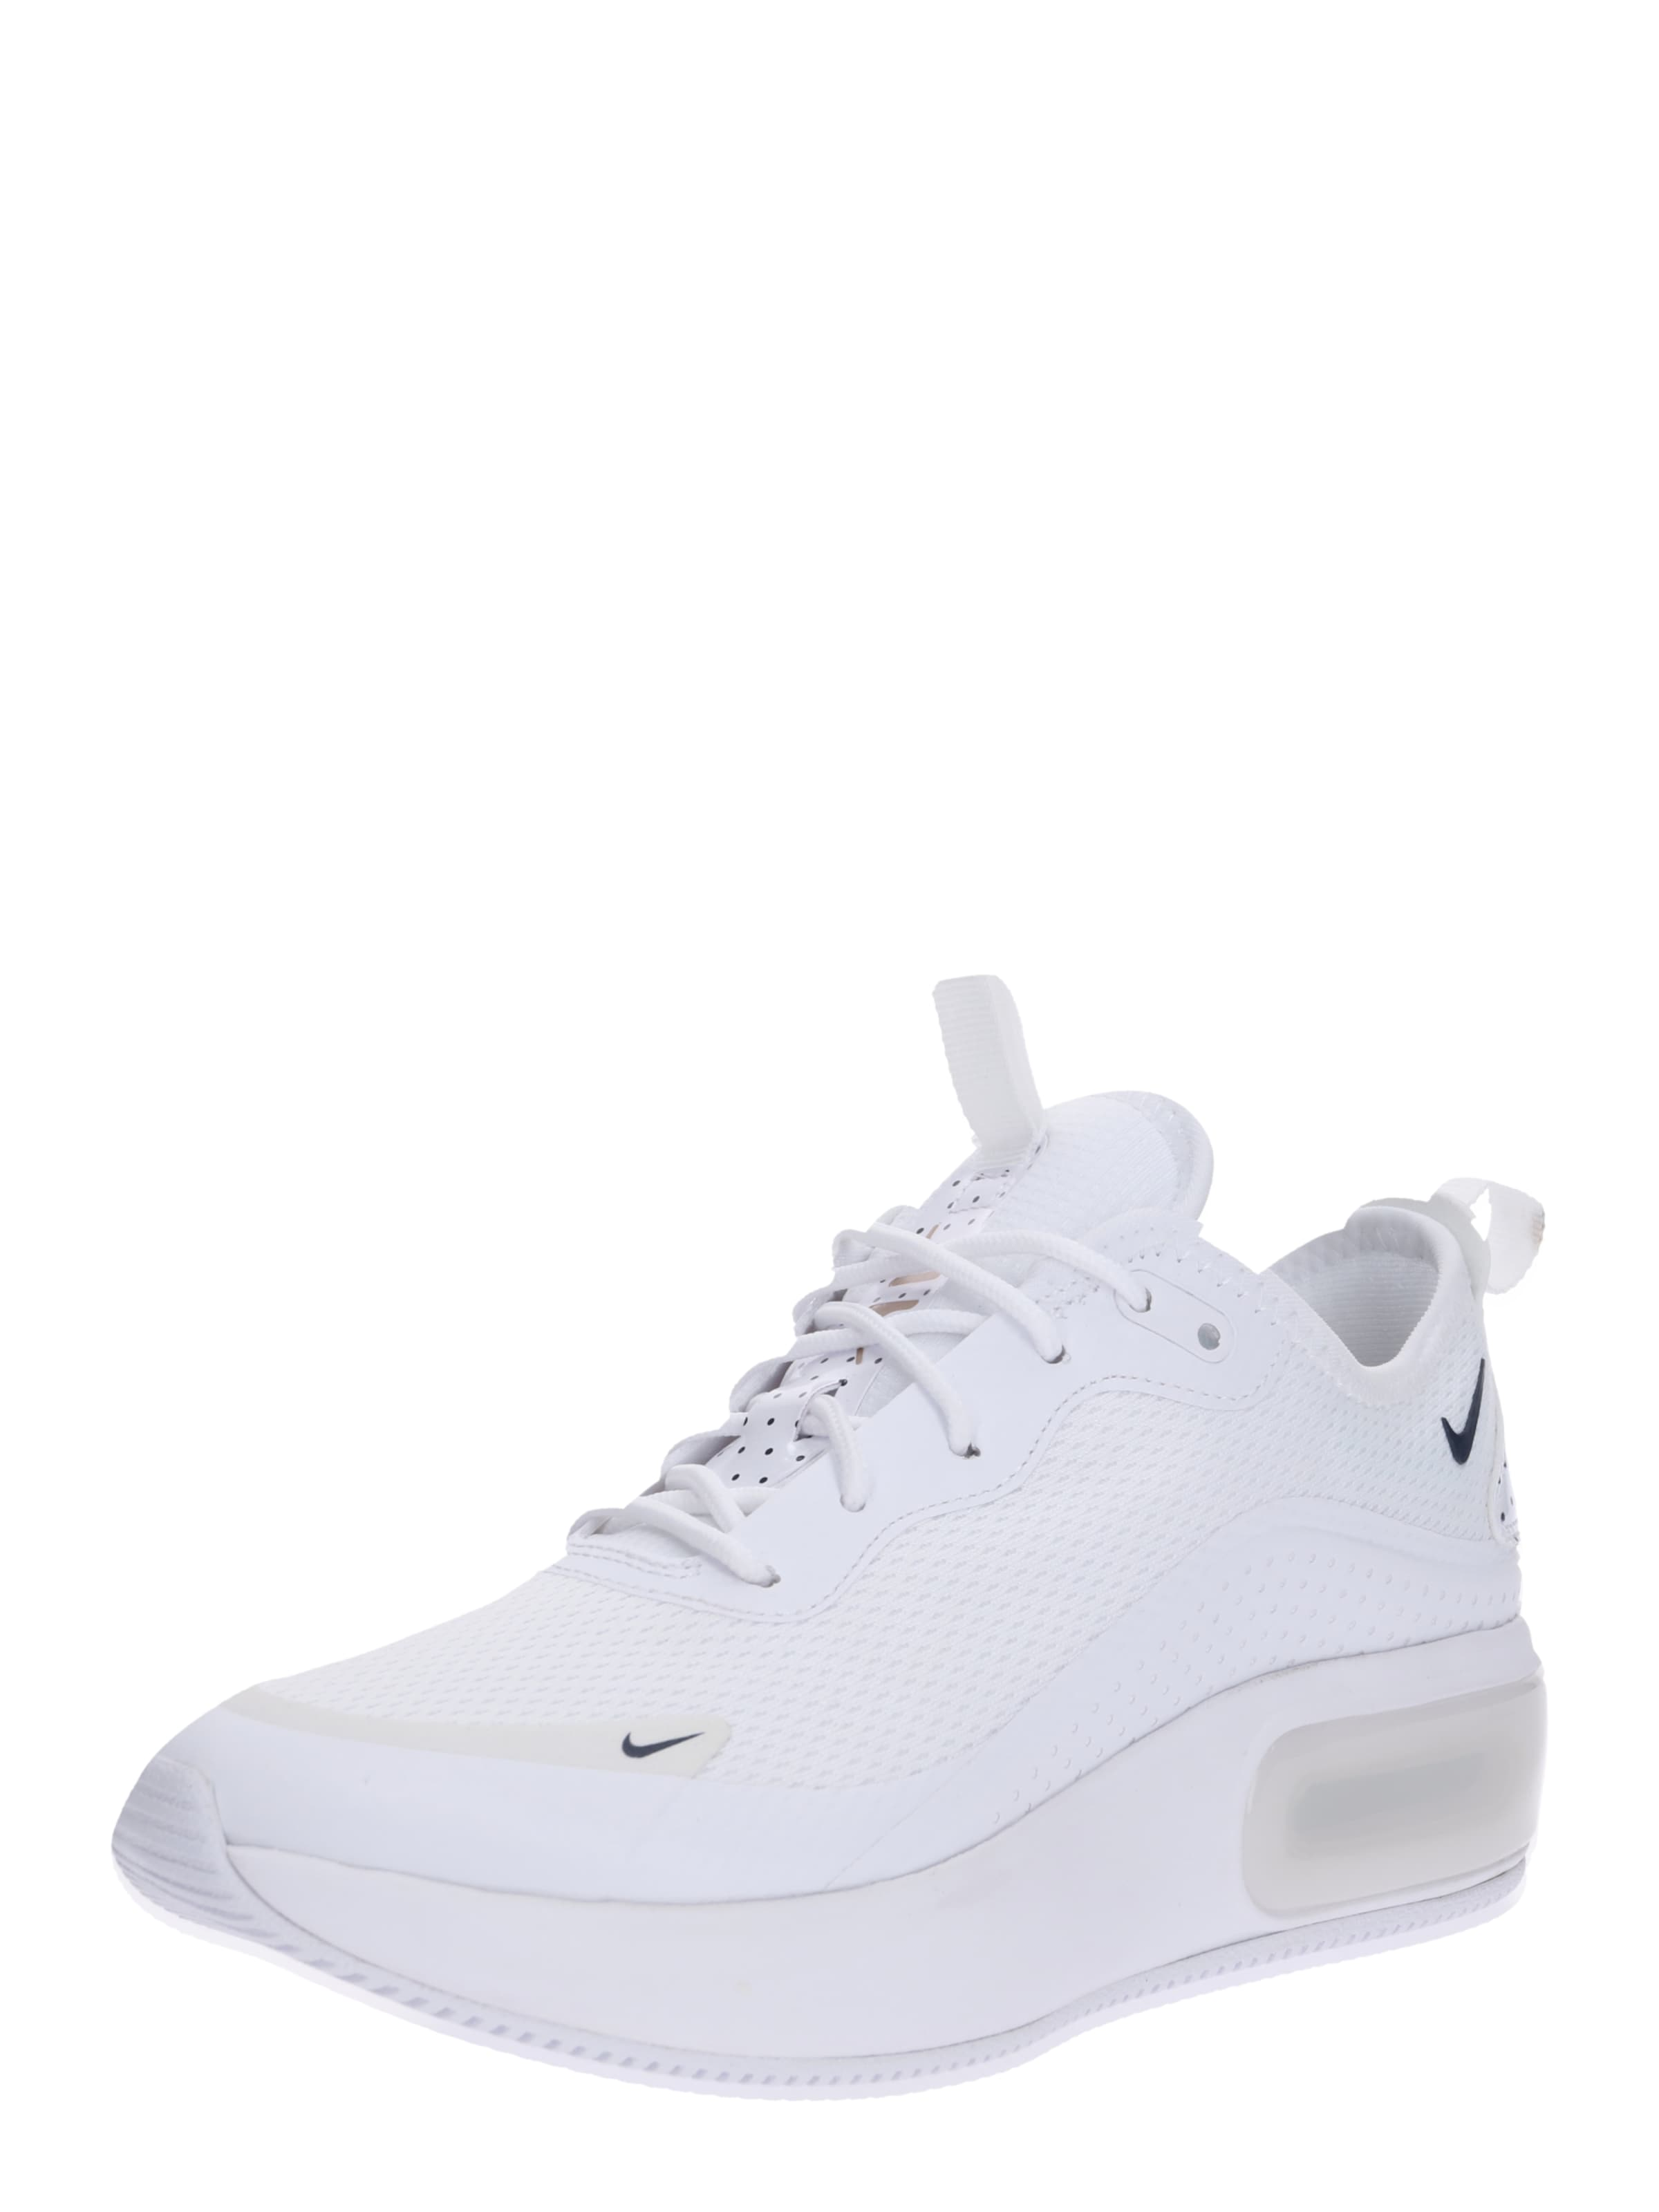 Nike Max Baskets Se' Sportswear 'w Dia Bleu MarineBlanc Air Basses En kX8nO0wP